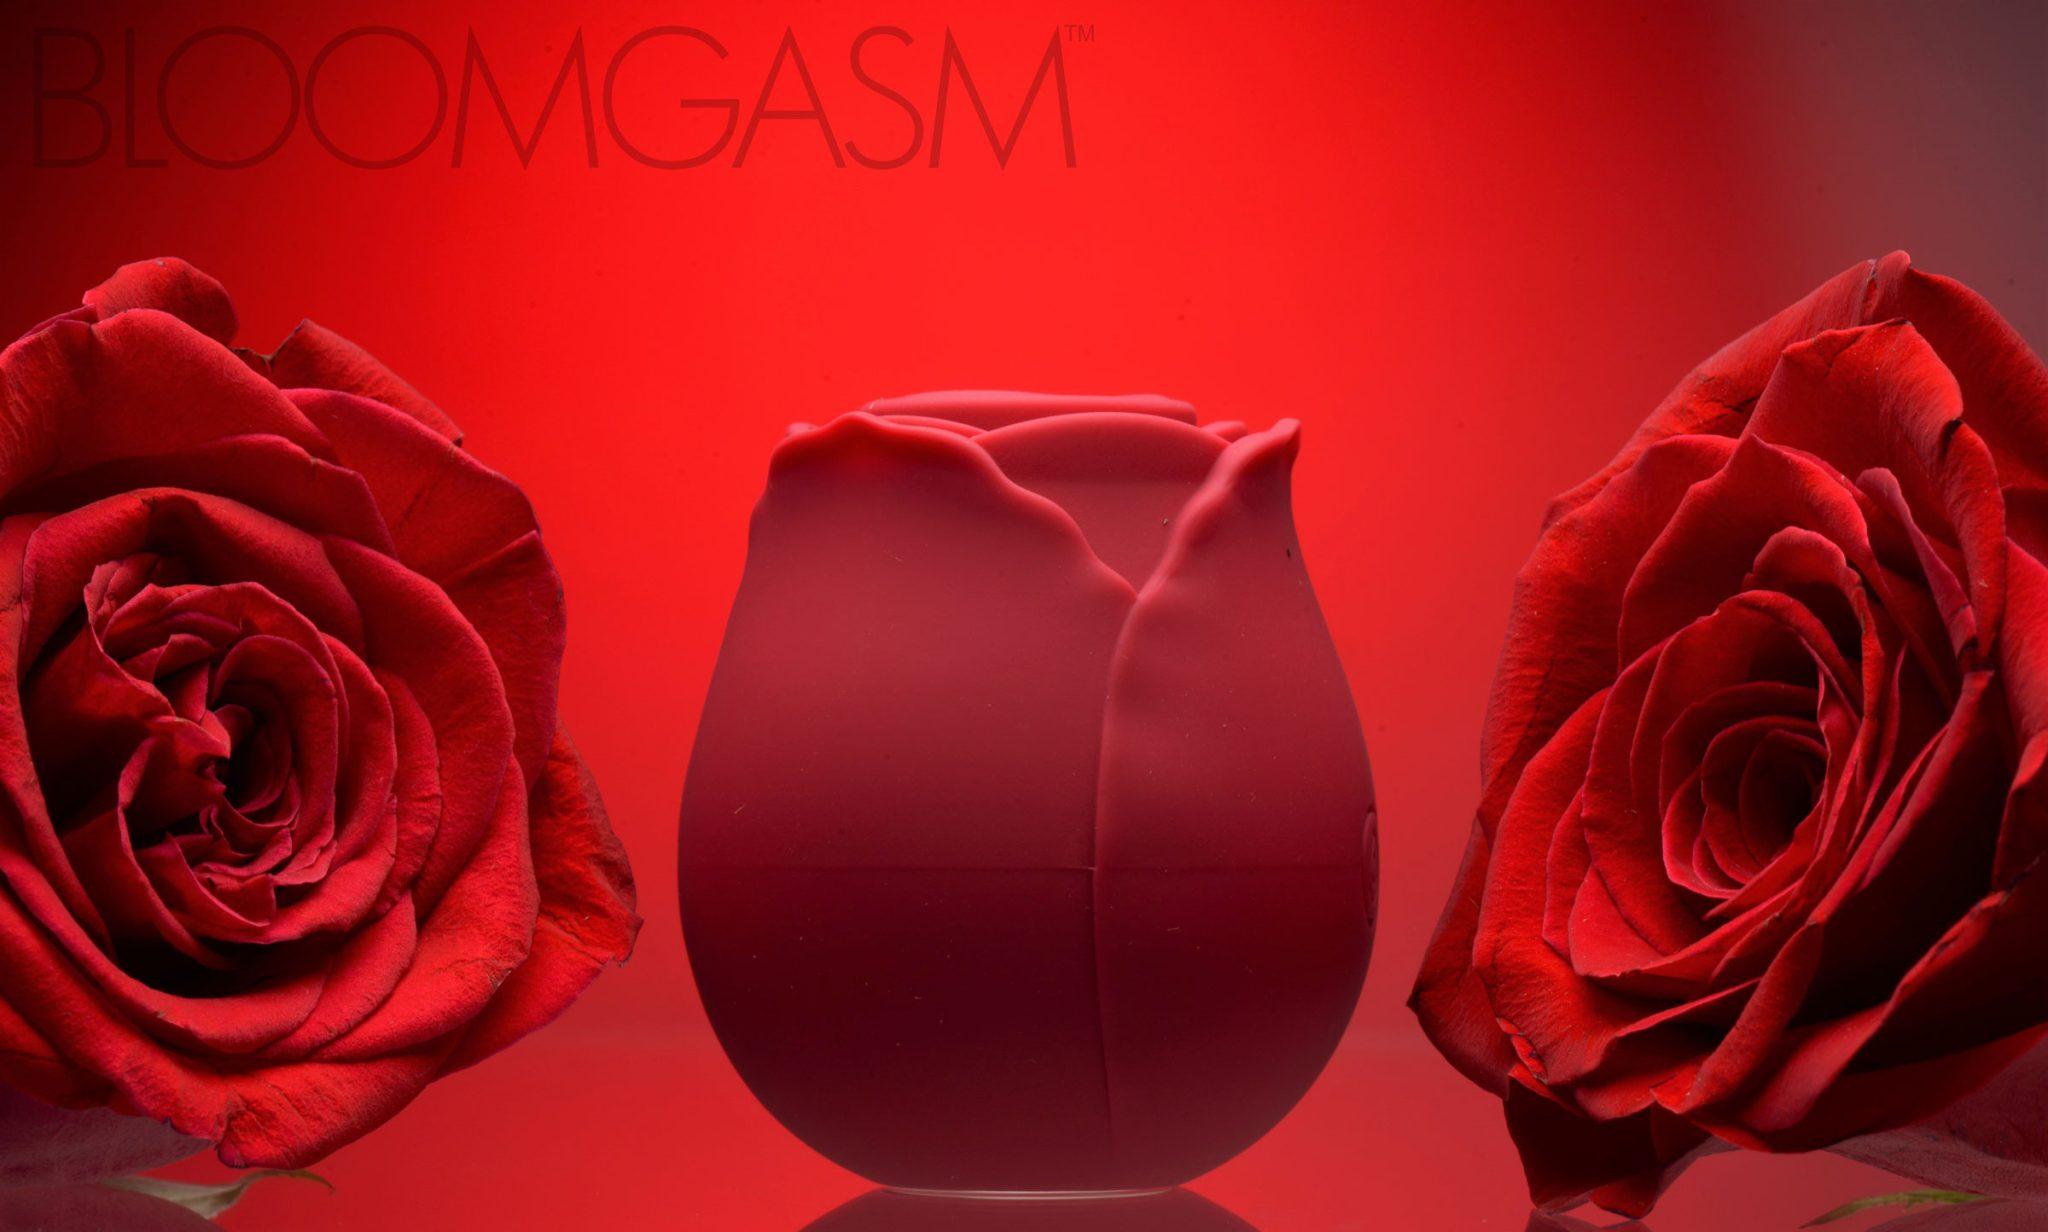 Bloomgasm Wild Rose 10X Silicone Clit Stimulator